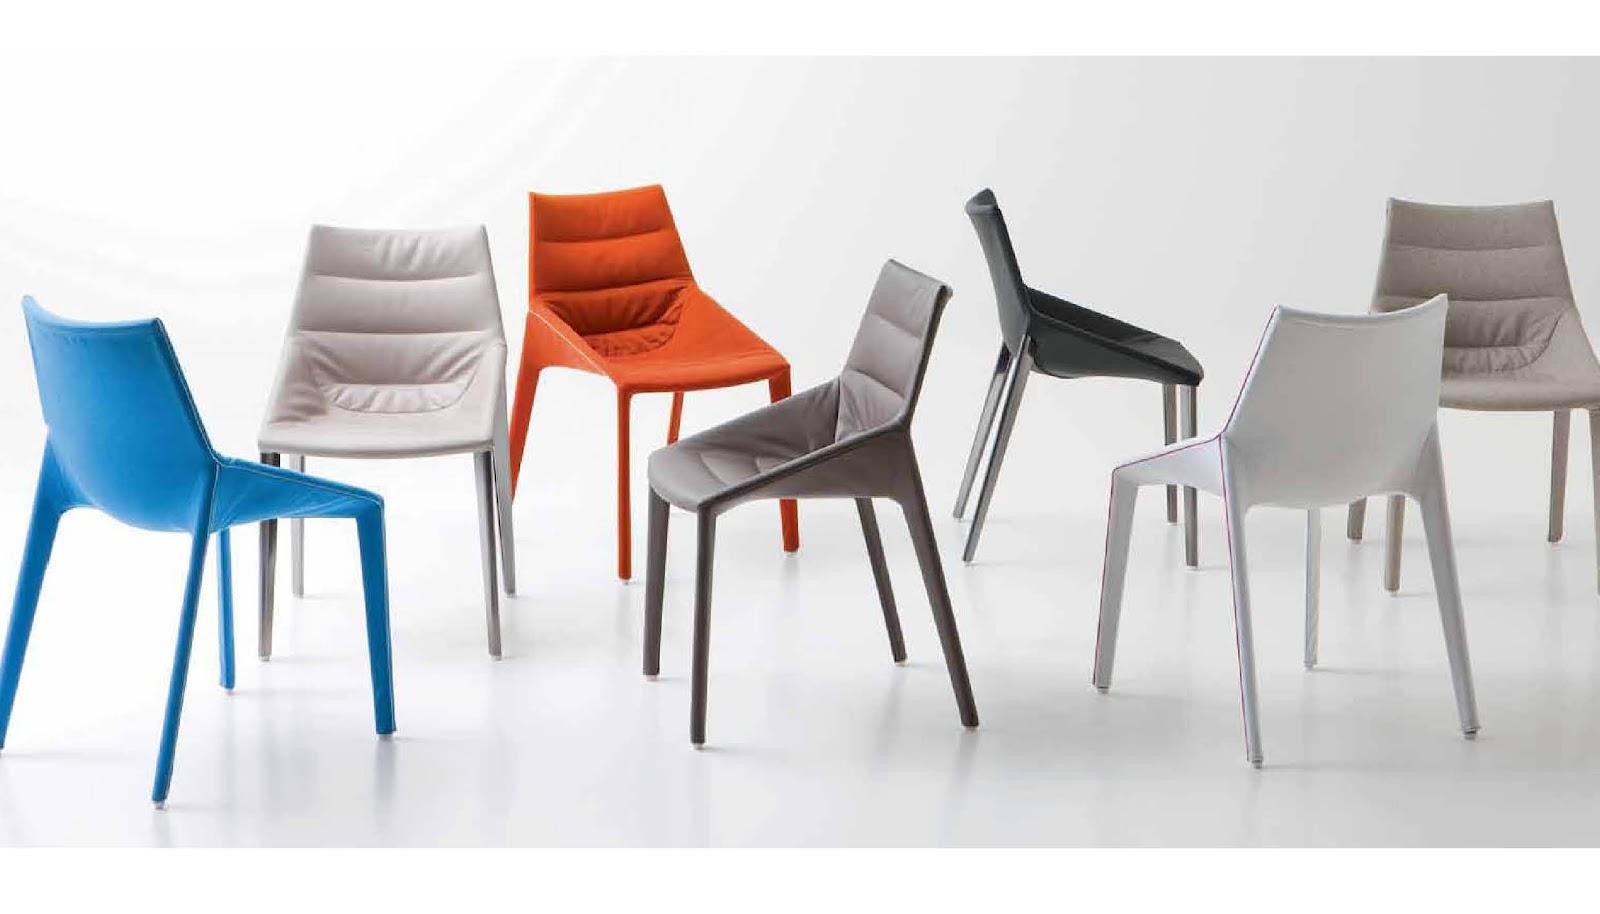 leimgruber innenraum outline der stuhl mit profil. Black Bedroom Furniture Sets. Home Design Ideas